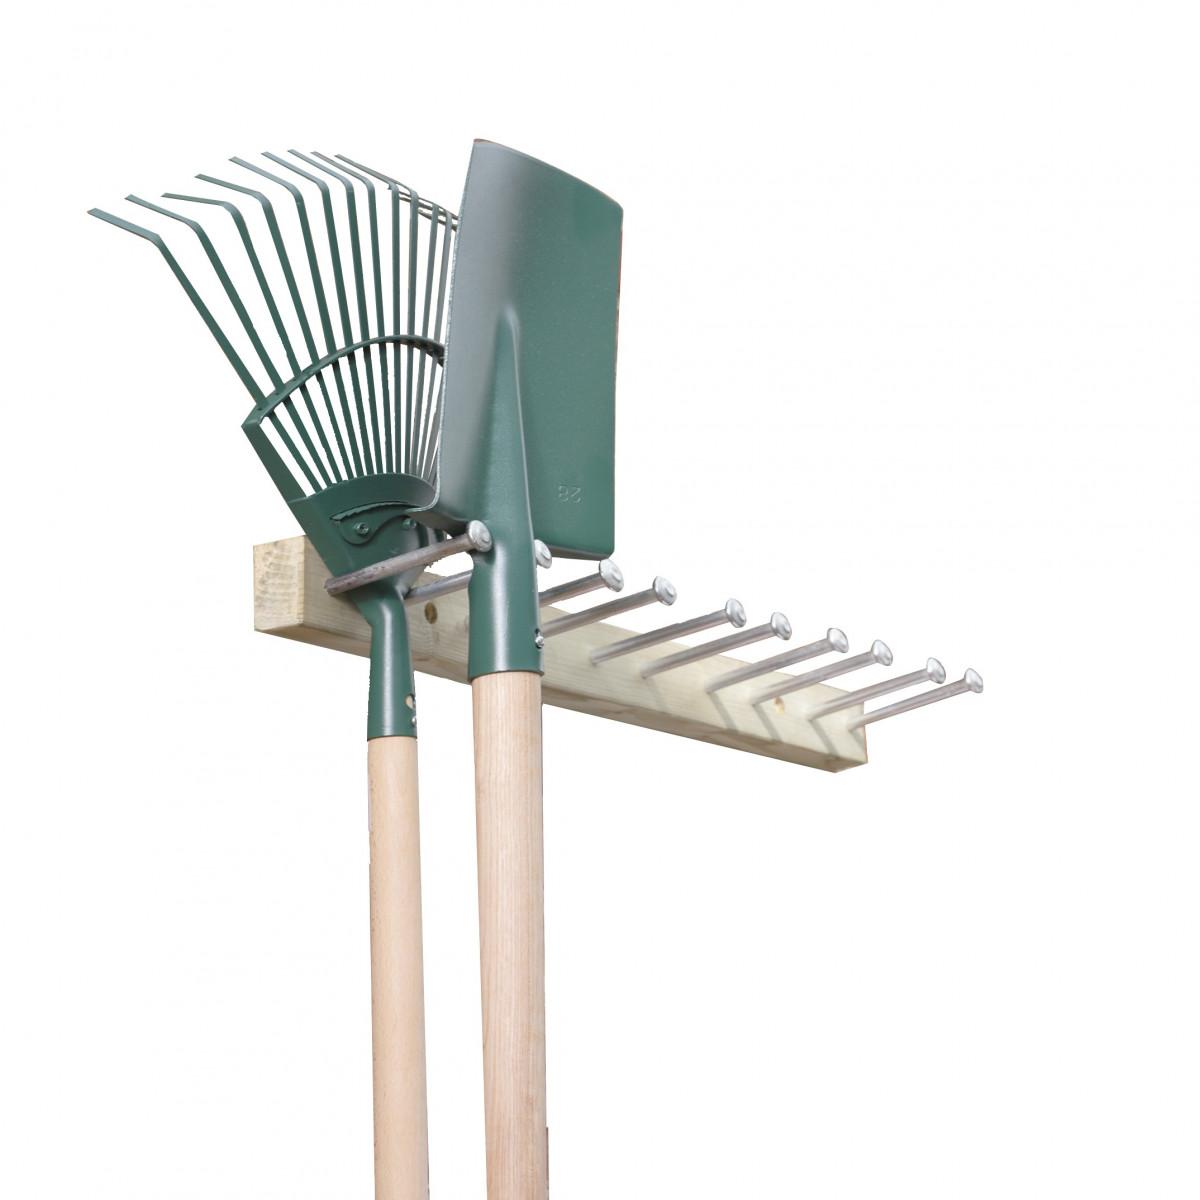 Porte outils jardin bois rangement outils for Porte ustensile mural